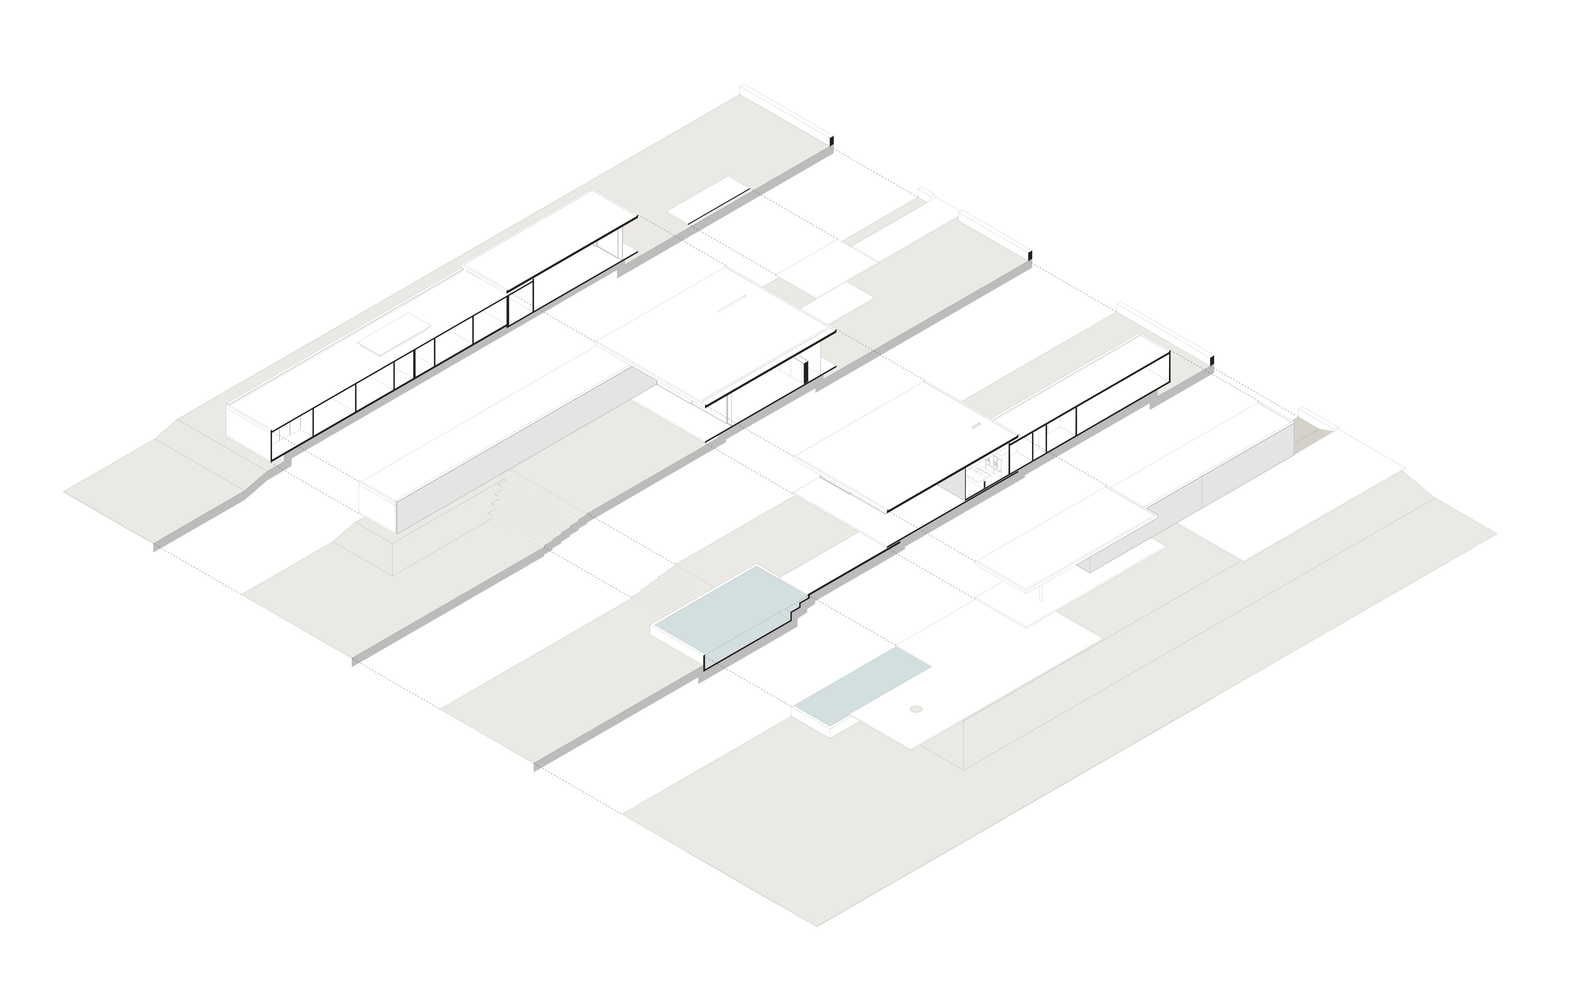 Gallery Of Mi Casa Studio Valeria Gontijo 23 In 2020 Axonometric Drawing Residential Gallery